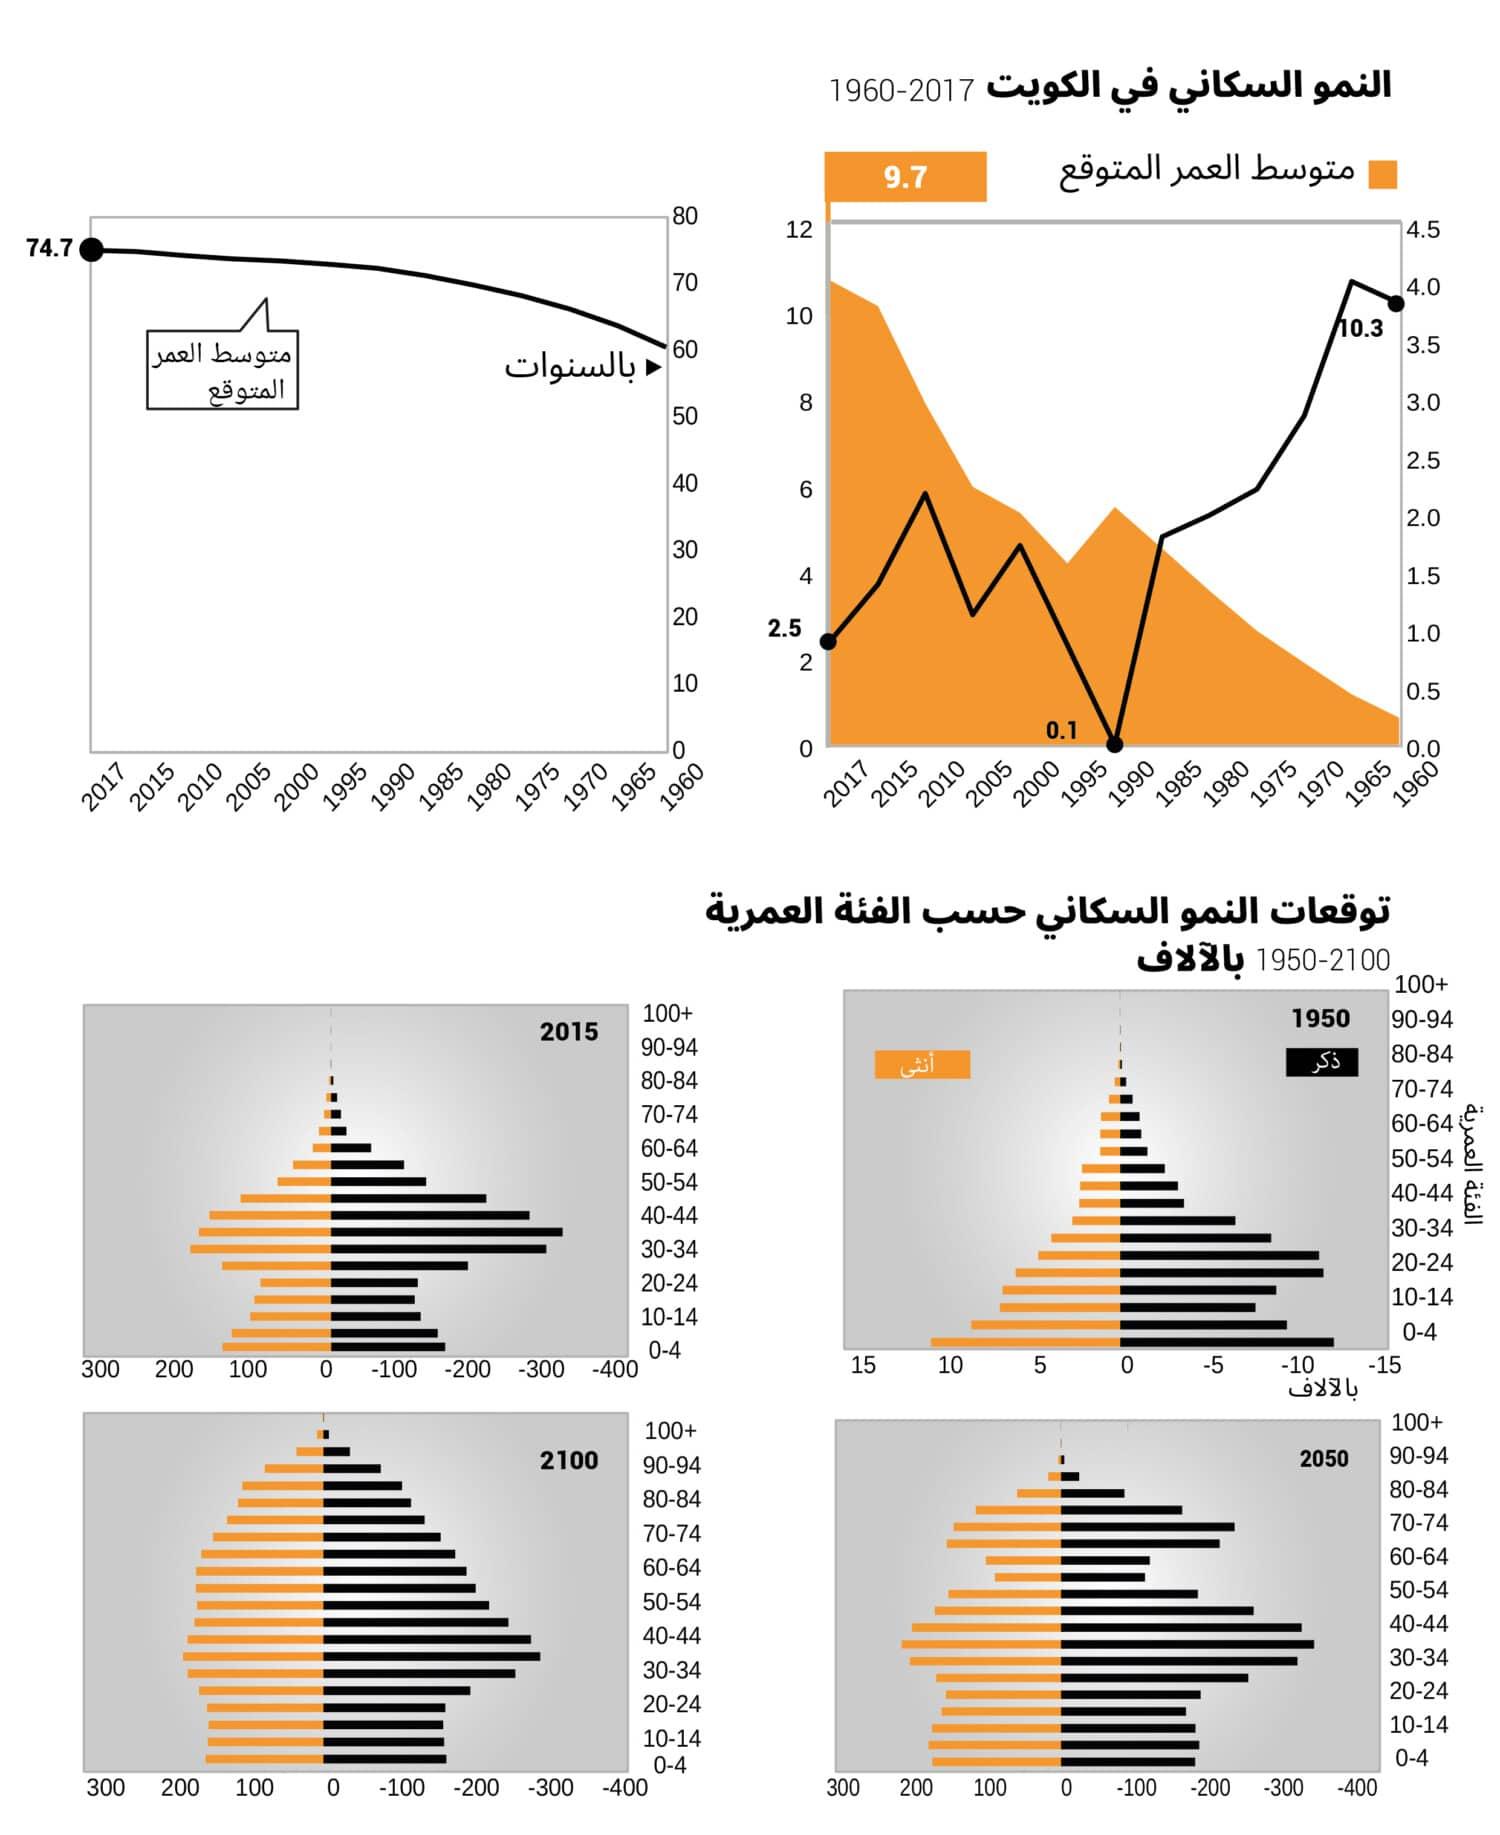 kuwait population growth